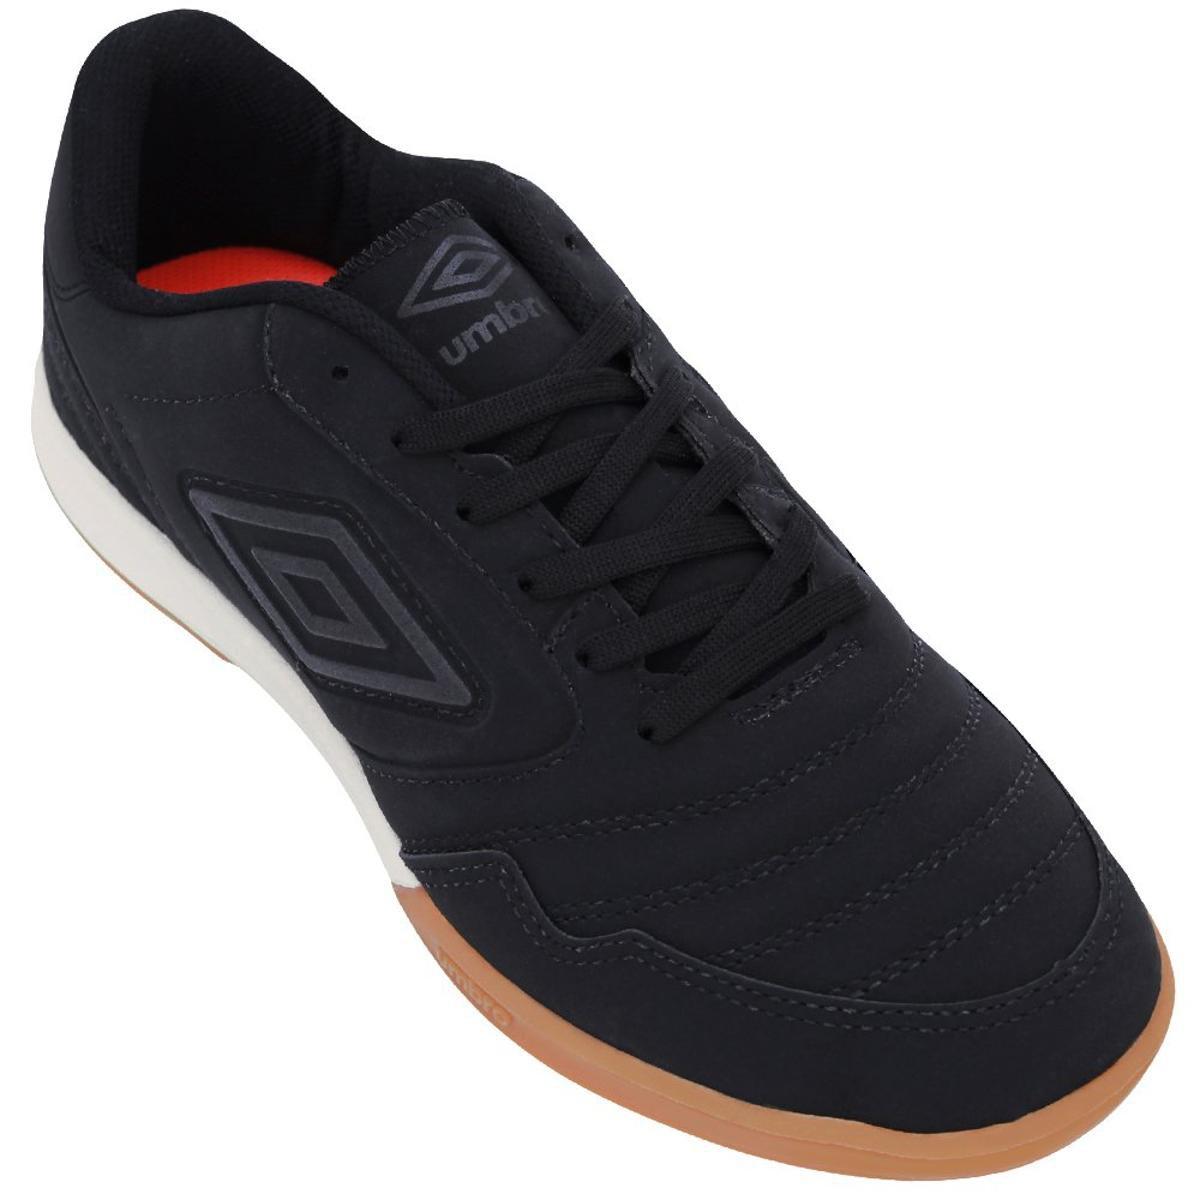 6625d34ba1 Chuteira Futsal Street F5 Umbro Masculina